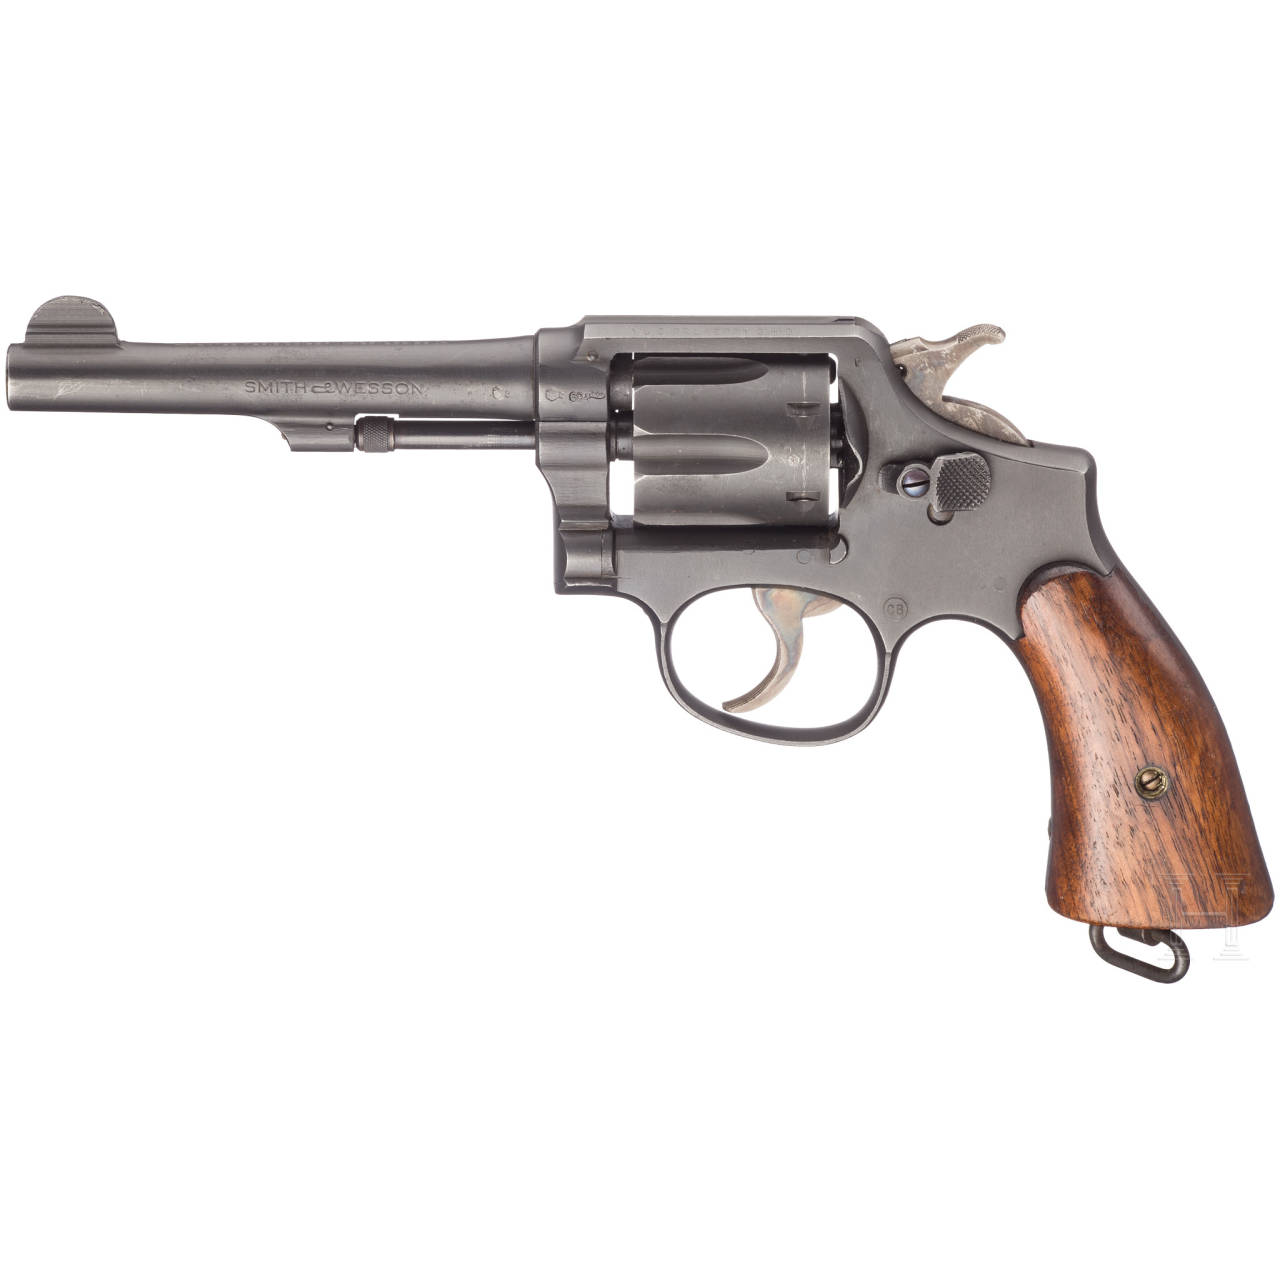 Smith & Wesson M & P Victory-Modell, Polizei Kiel